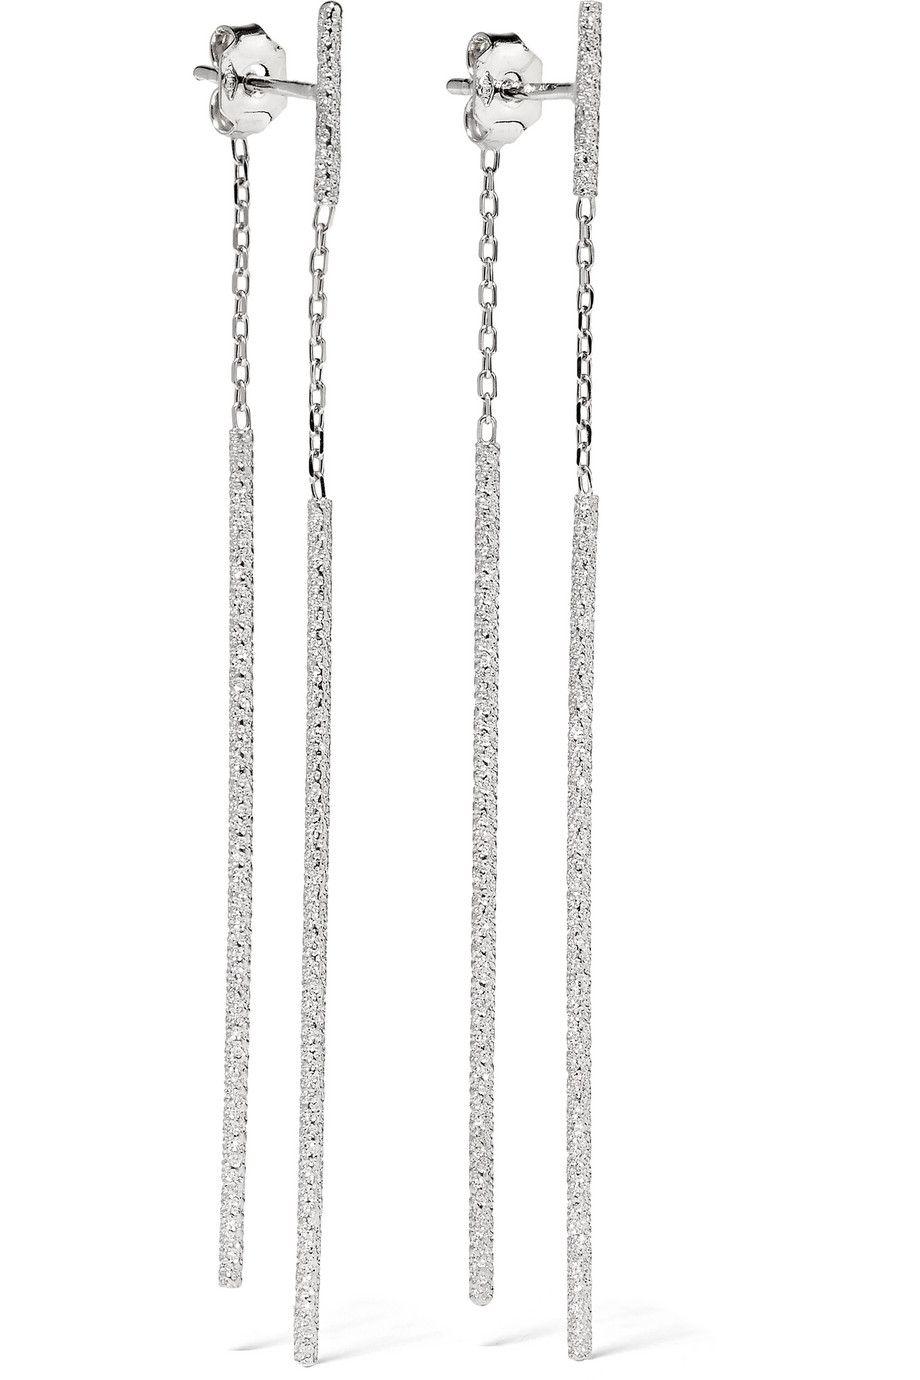 Double Magic Wand 18-karat Gold Earrings - one size Carolina Bucci 9Htl6PQ4lQ